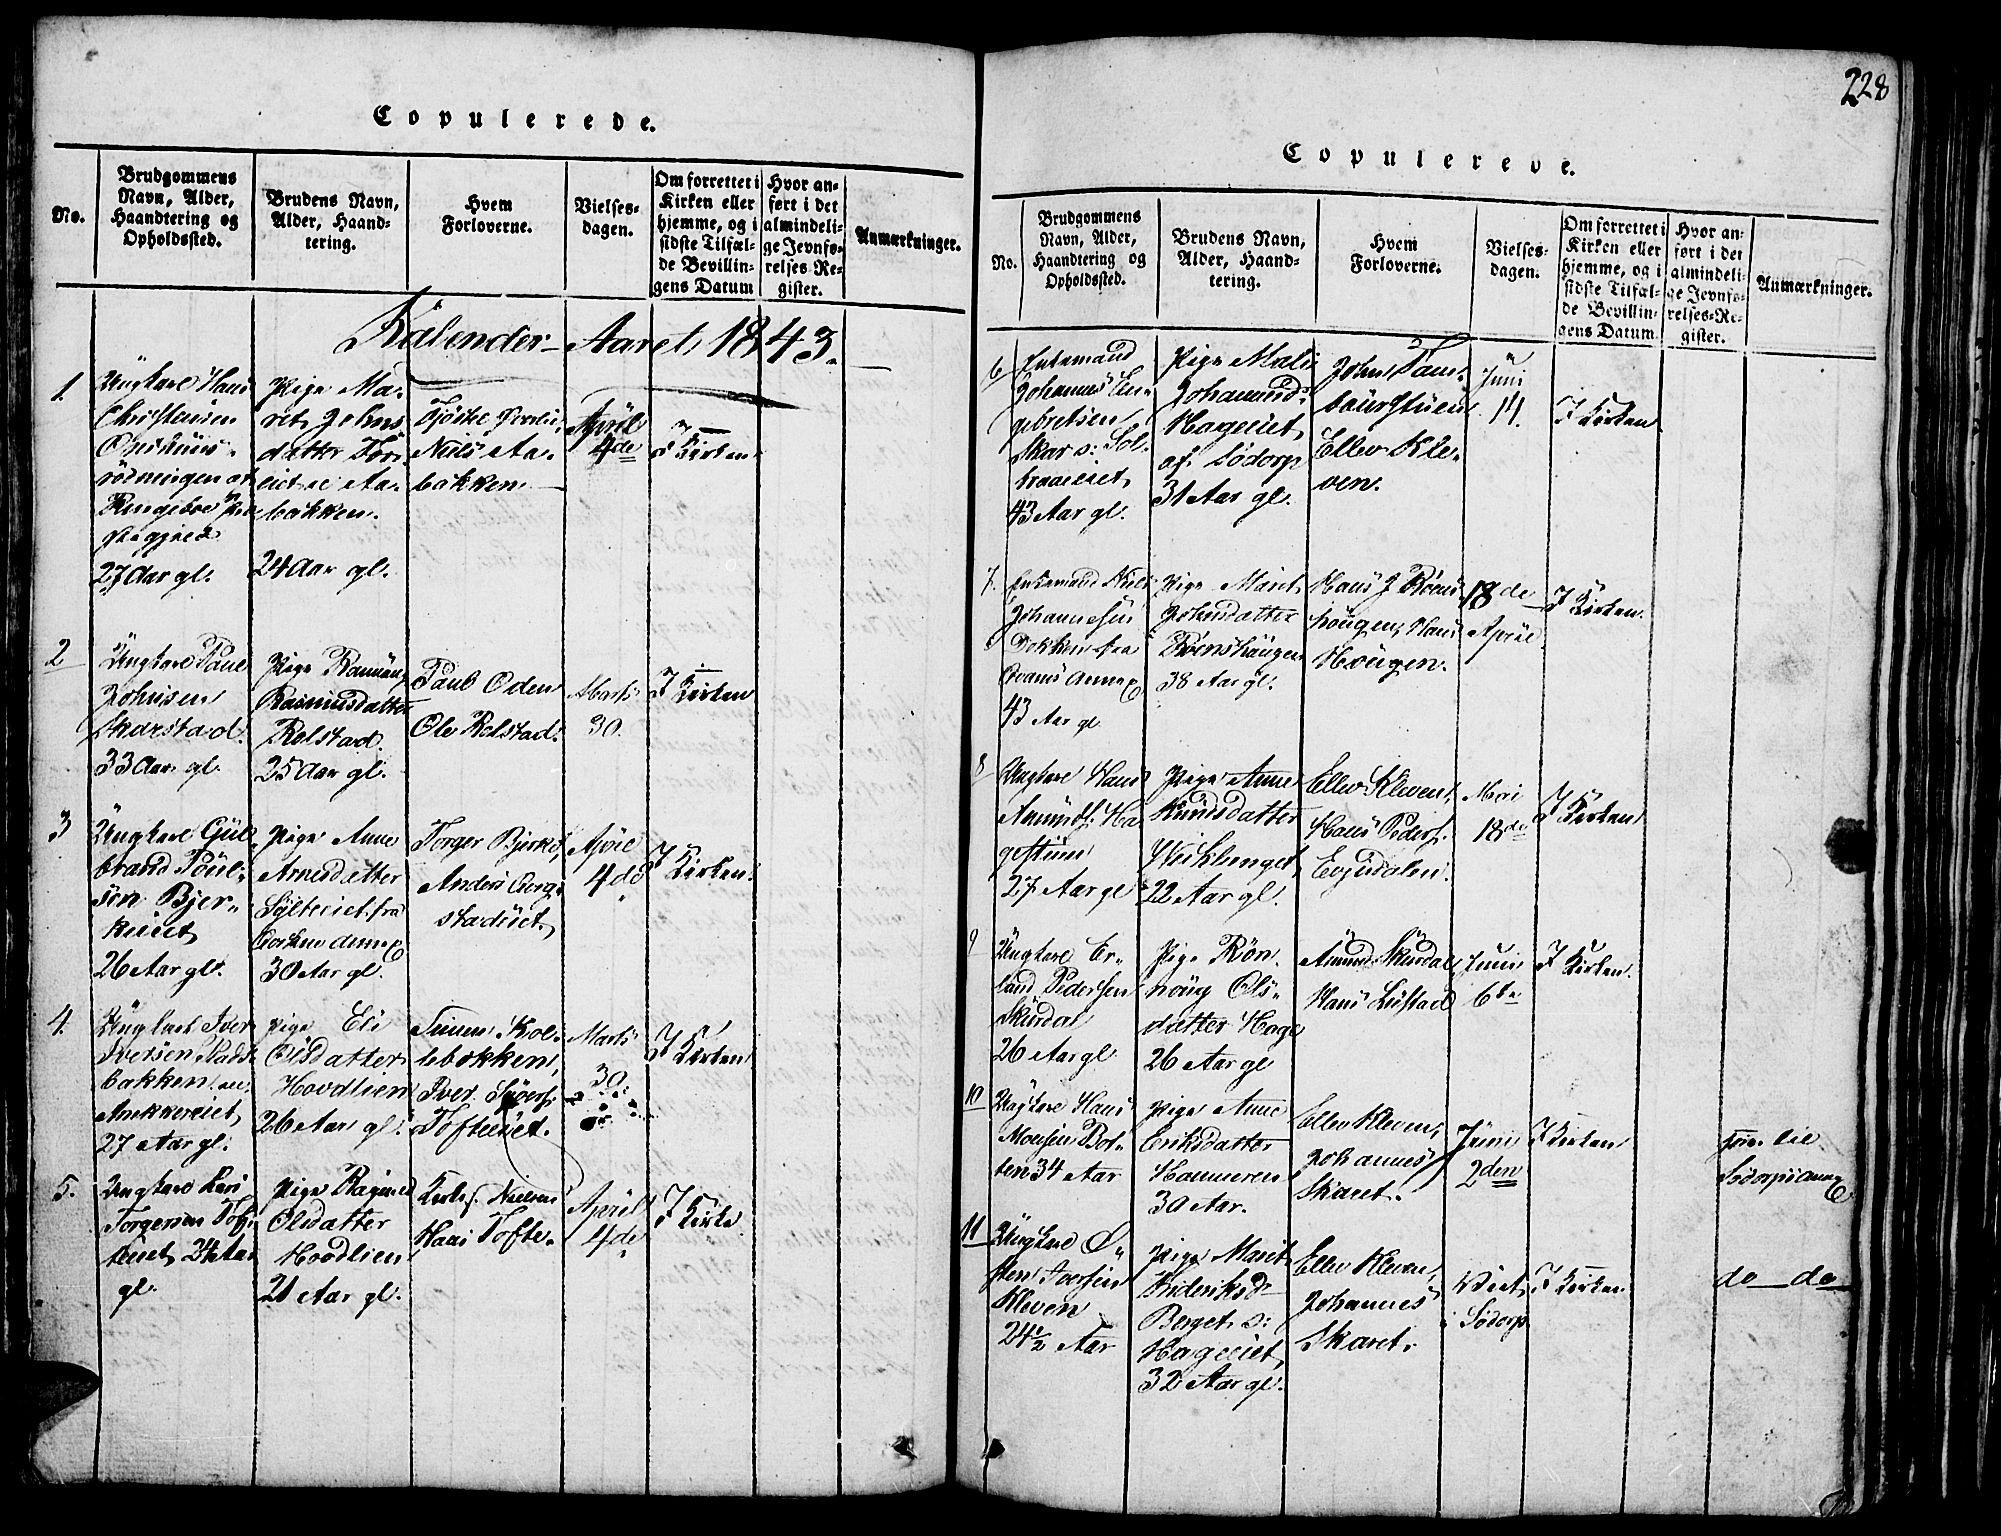 SAH, Fron prestekontor, H/Ha/Hab/L0001: Klokkerbok nr. 1, 1816-1843, s. 228